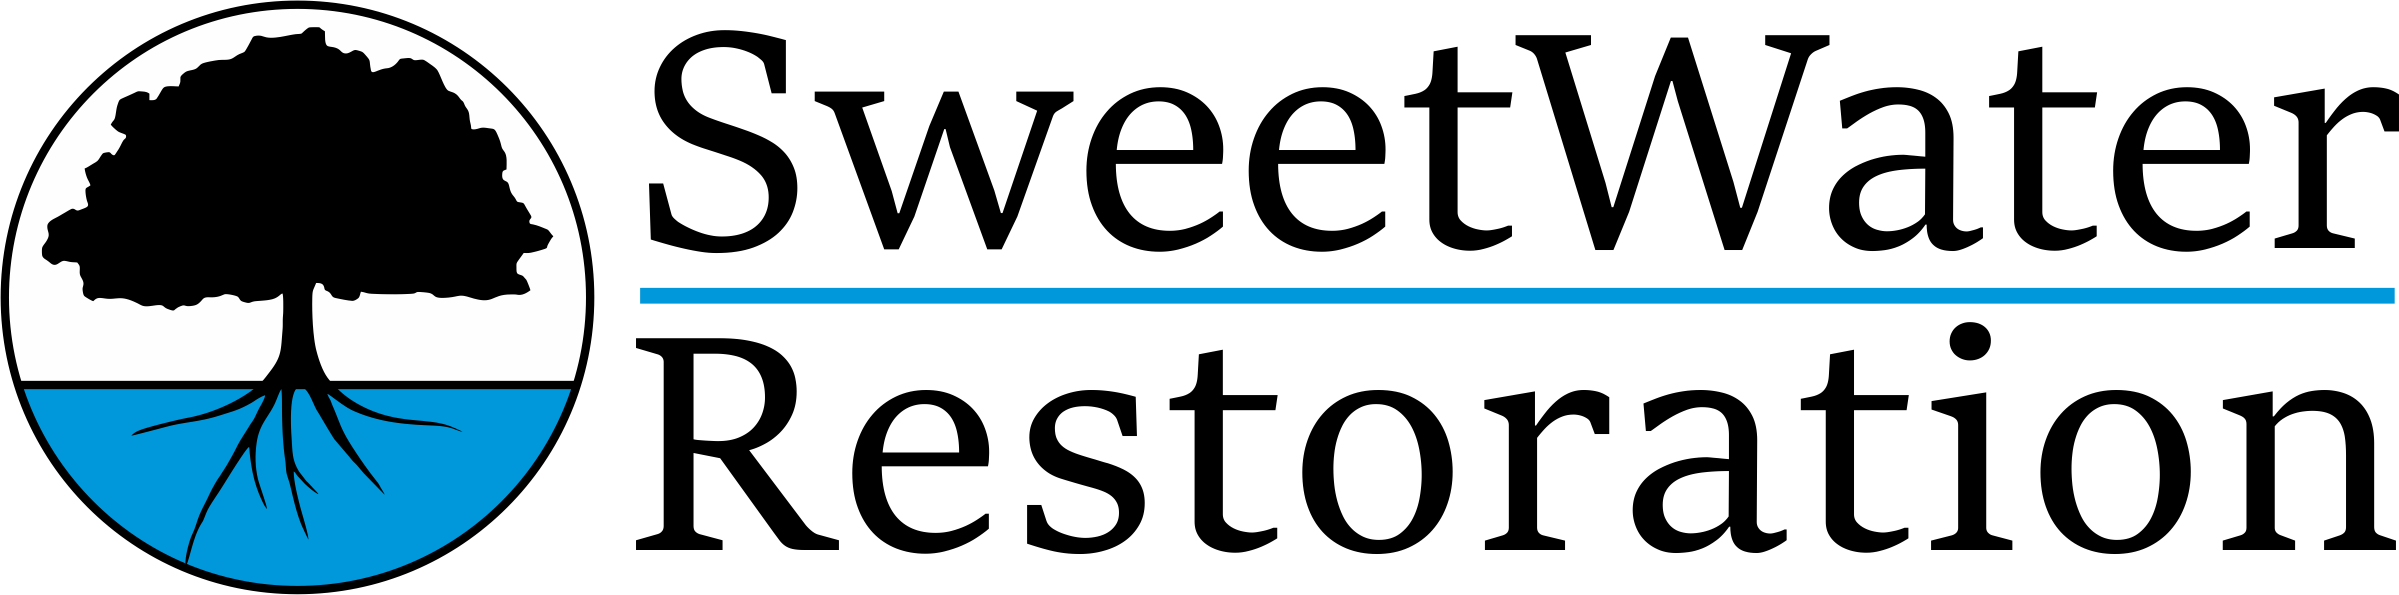 sweetwater restoration logo